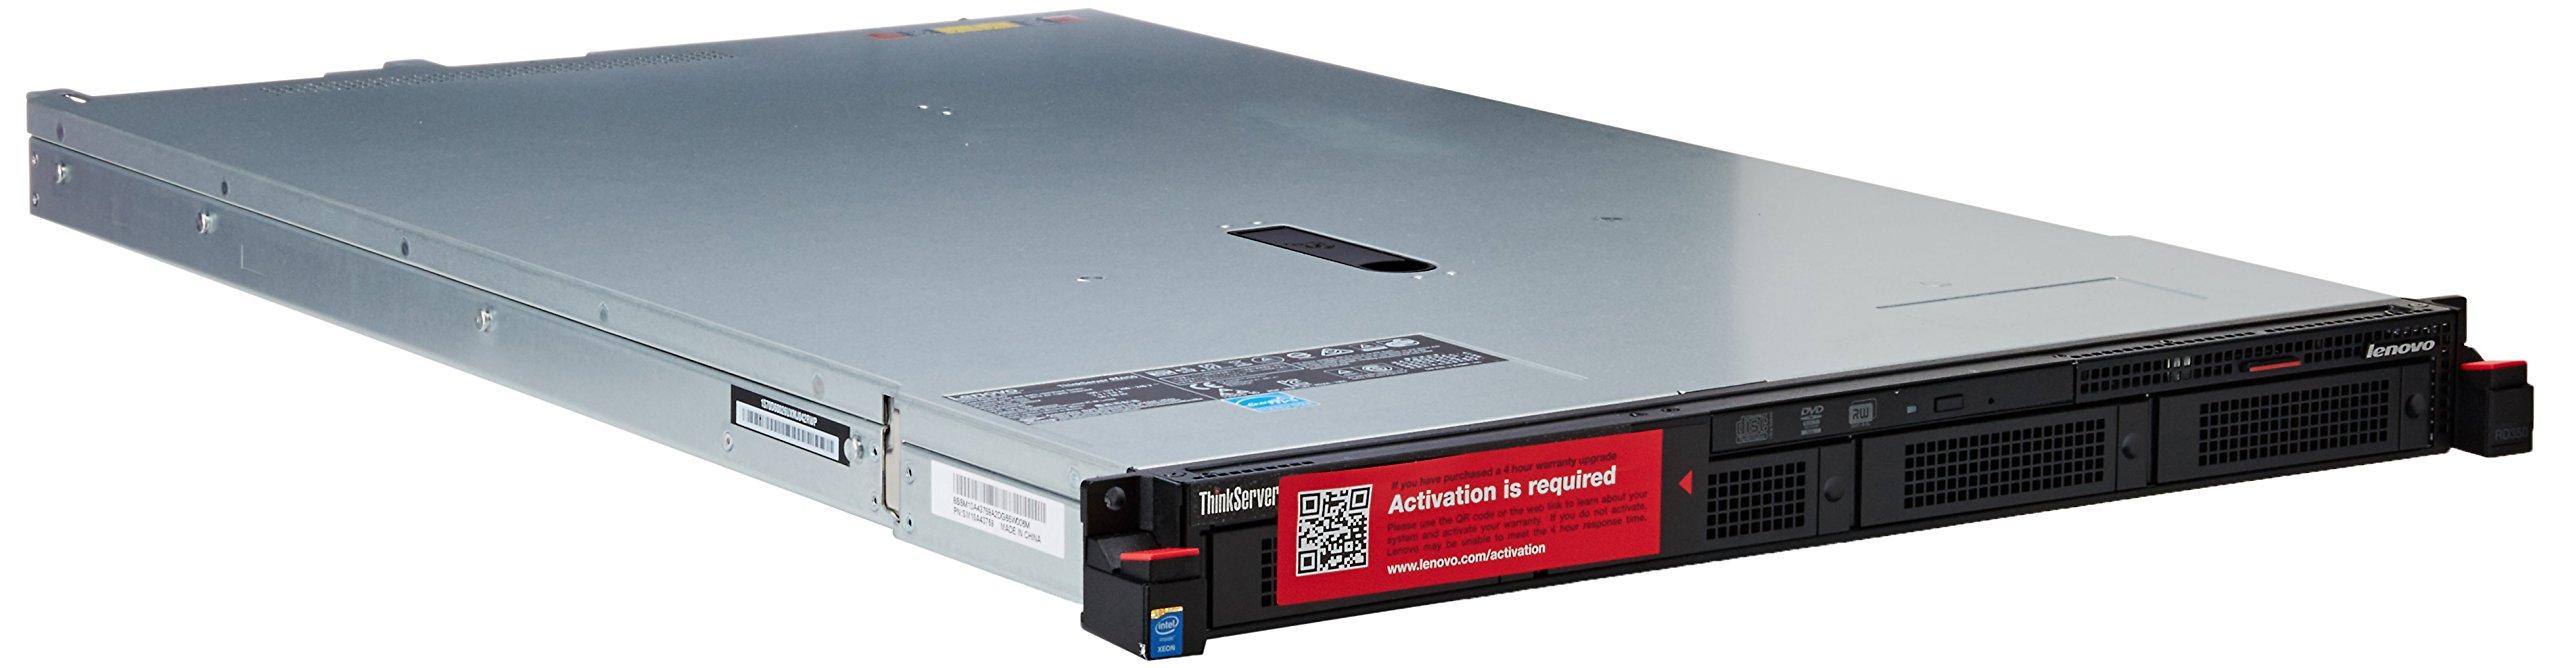 Lenovo ThinkServer RD350 70D60026UX 1U Rack Server - 1 x Intel Xeon E5-2630 v3 Octa-core (8 Core) 2.40 GHz